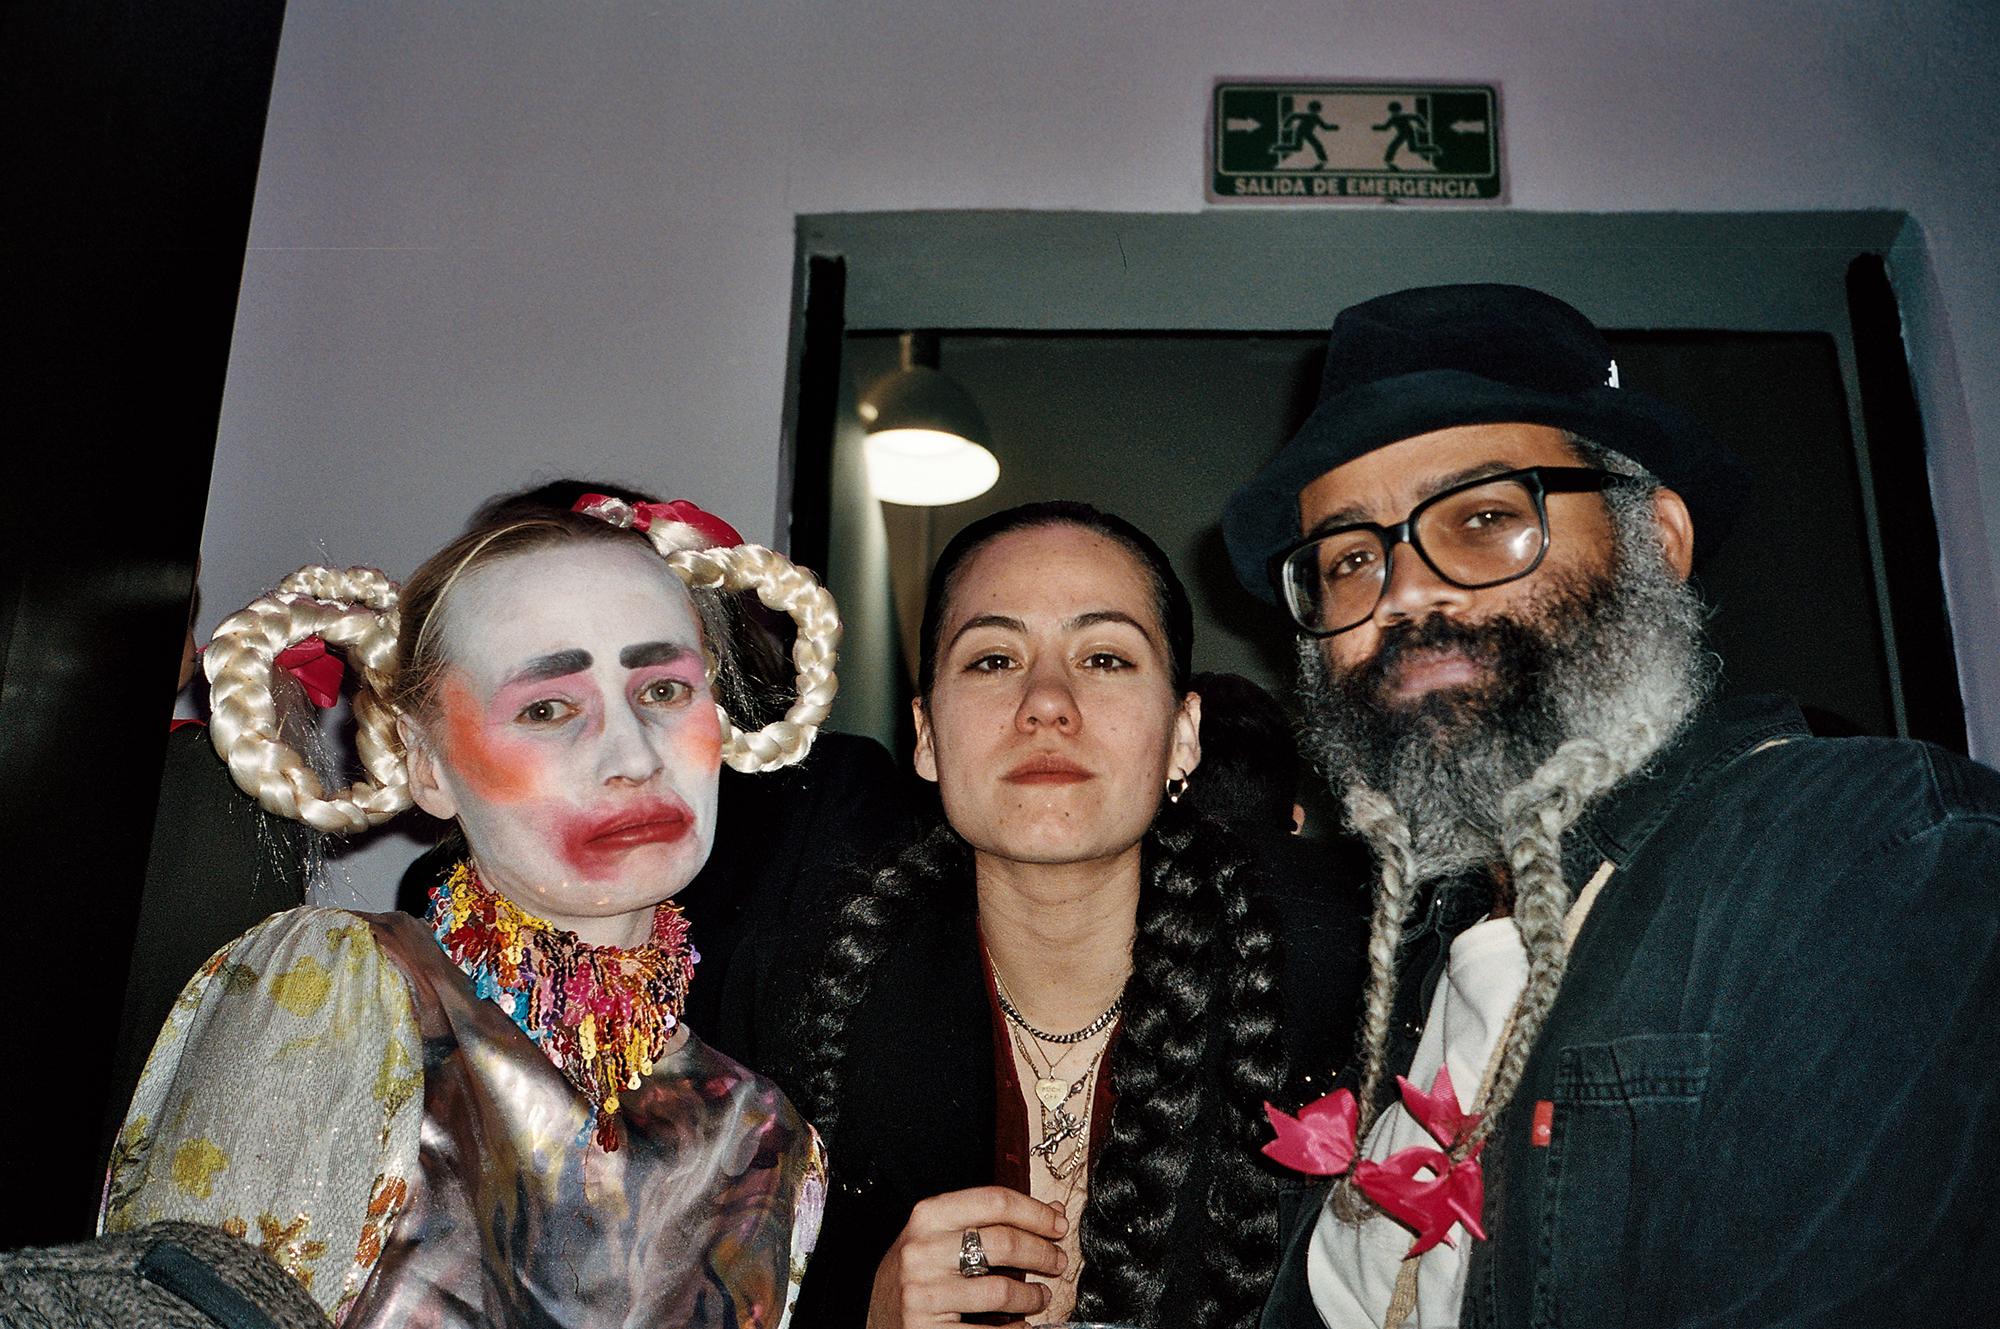 Kris Lemsalu, Mehhiko moekunstnik Bárbara Sánchez-Kane ja Kyp Malone. Foto: Maria Arusoo